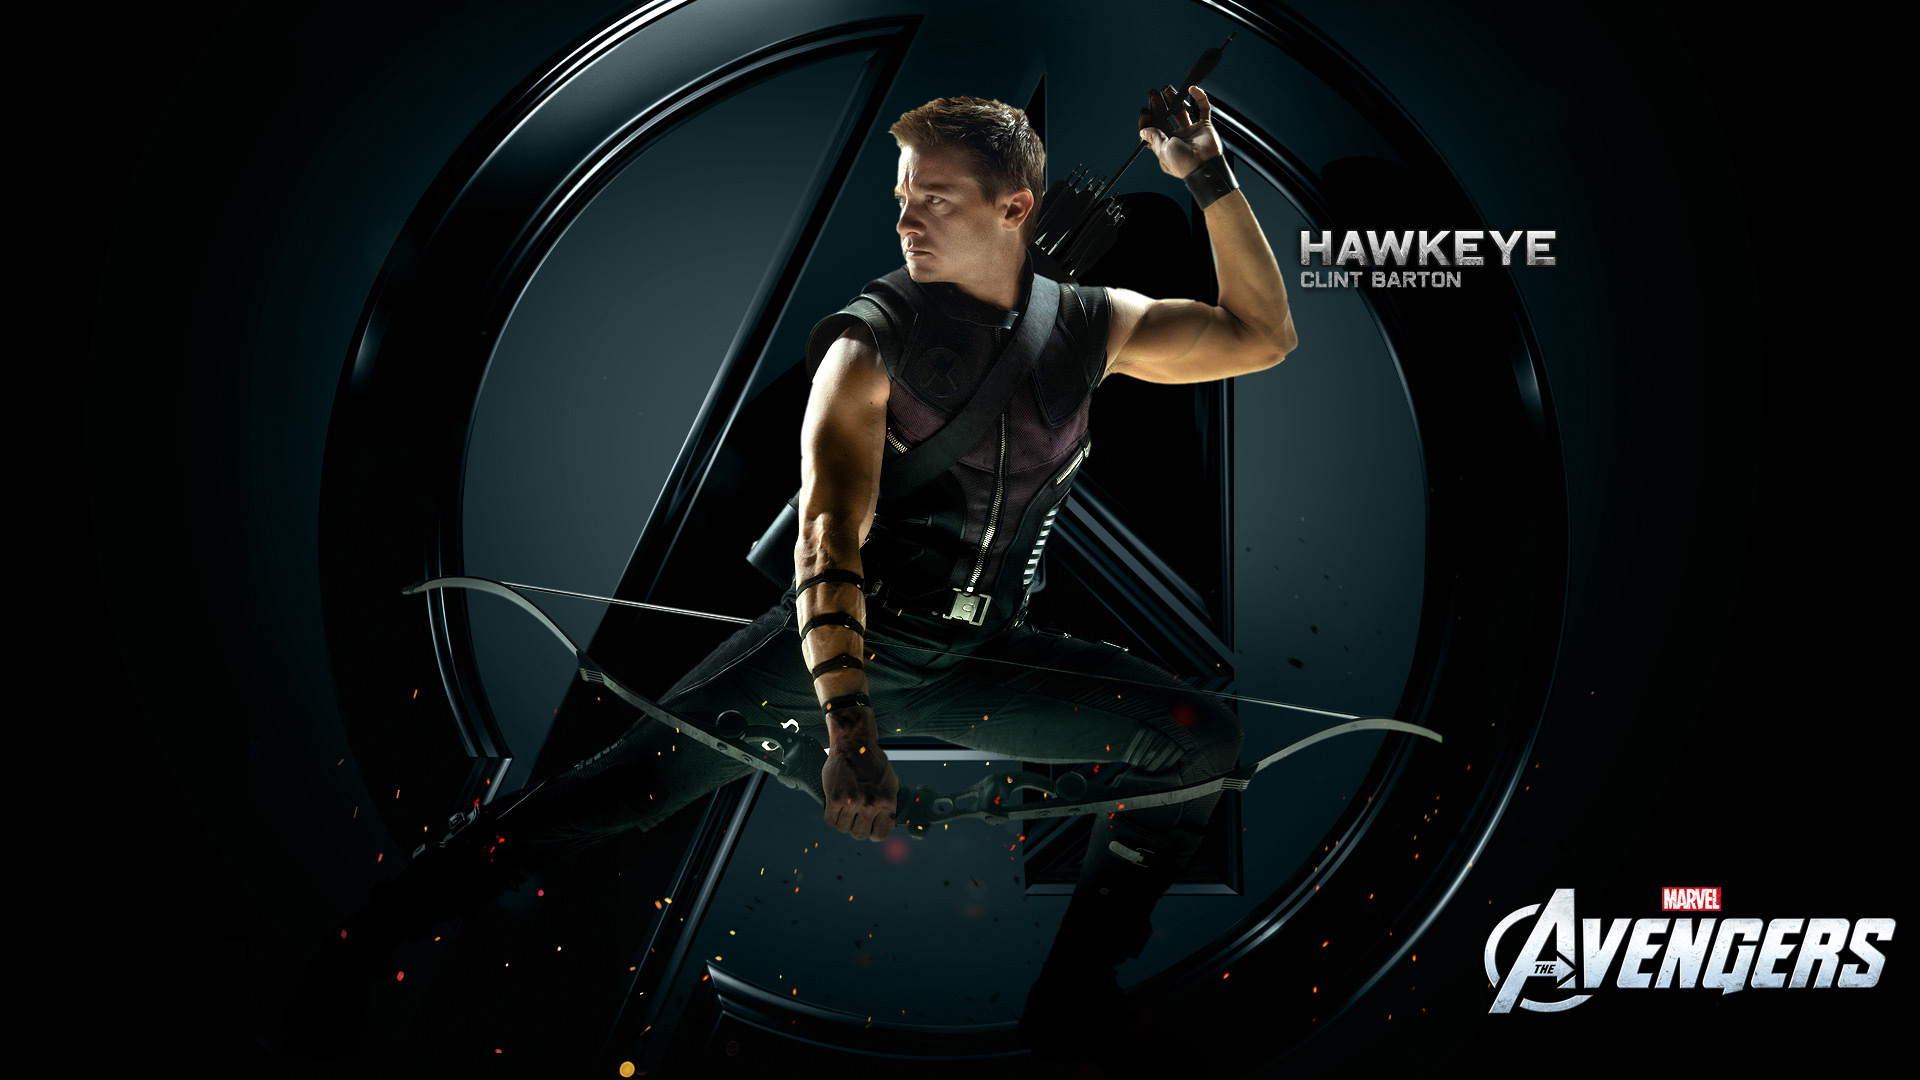 Hawkeye Clint Barton Wallpapers HD Wallpapers 1920x1080